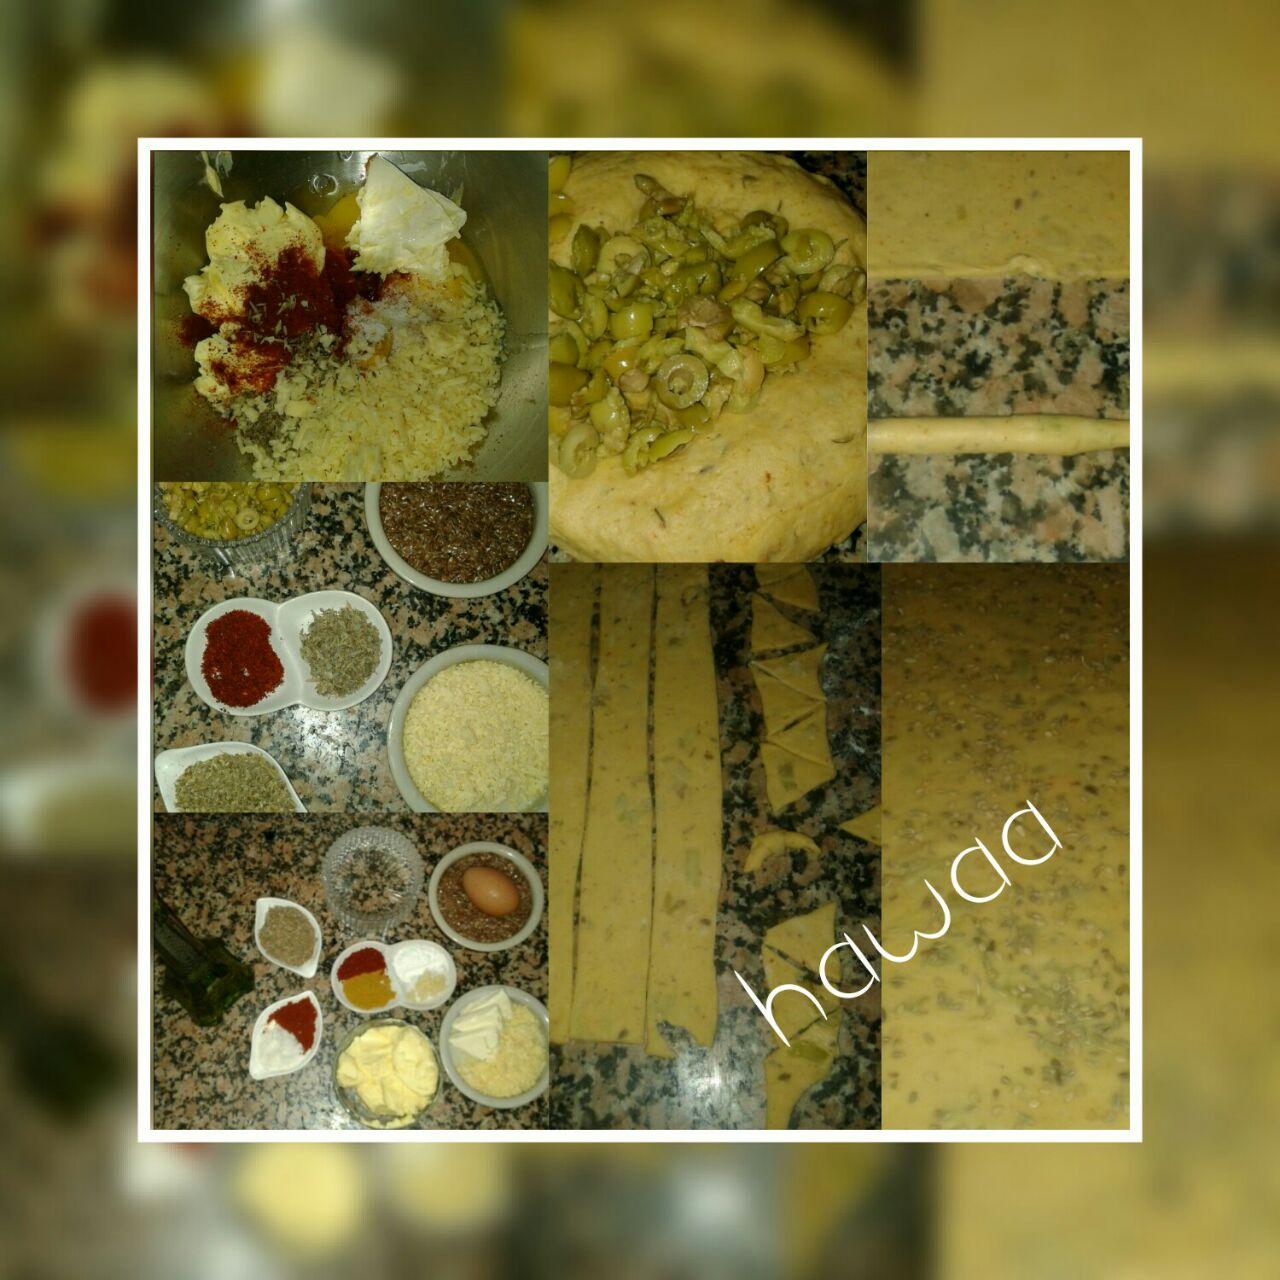 akhawat_islamway_1479913392__img_20161122_115621.jpg